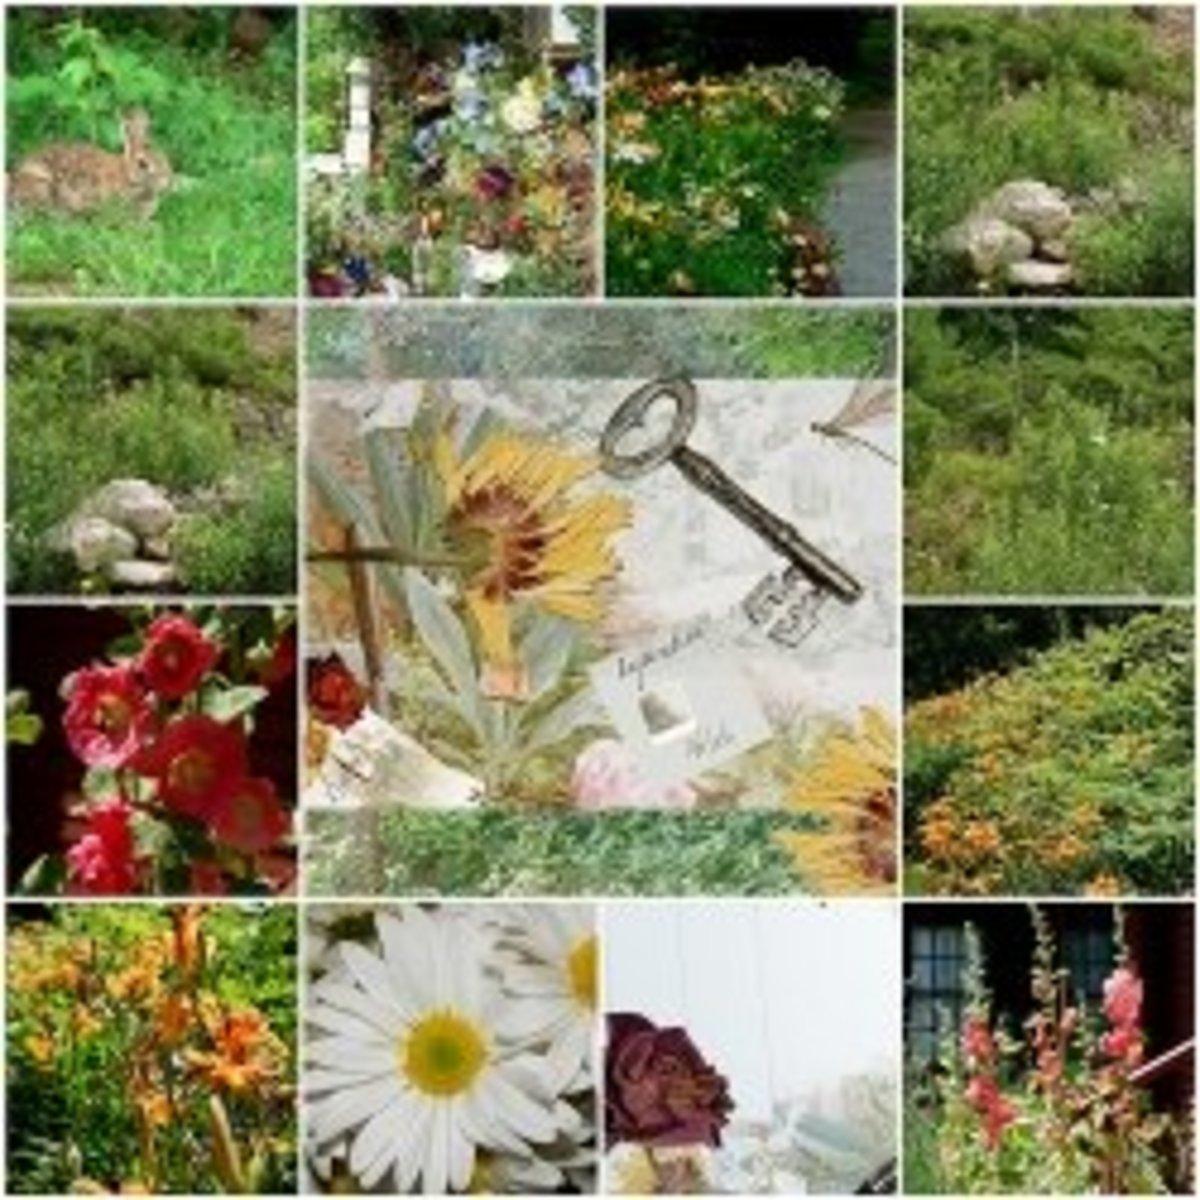 Teaching Critical Literacy with The Secret Garden